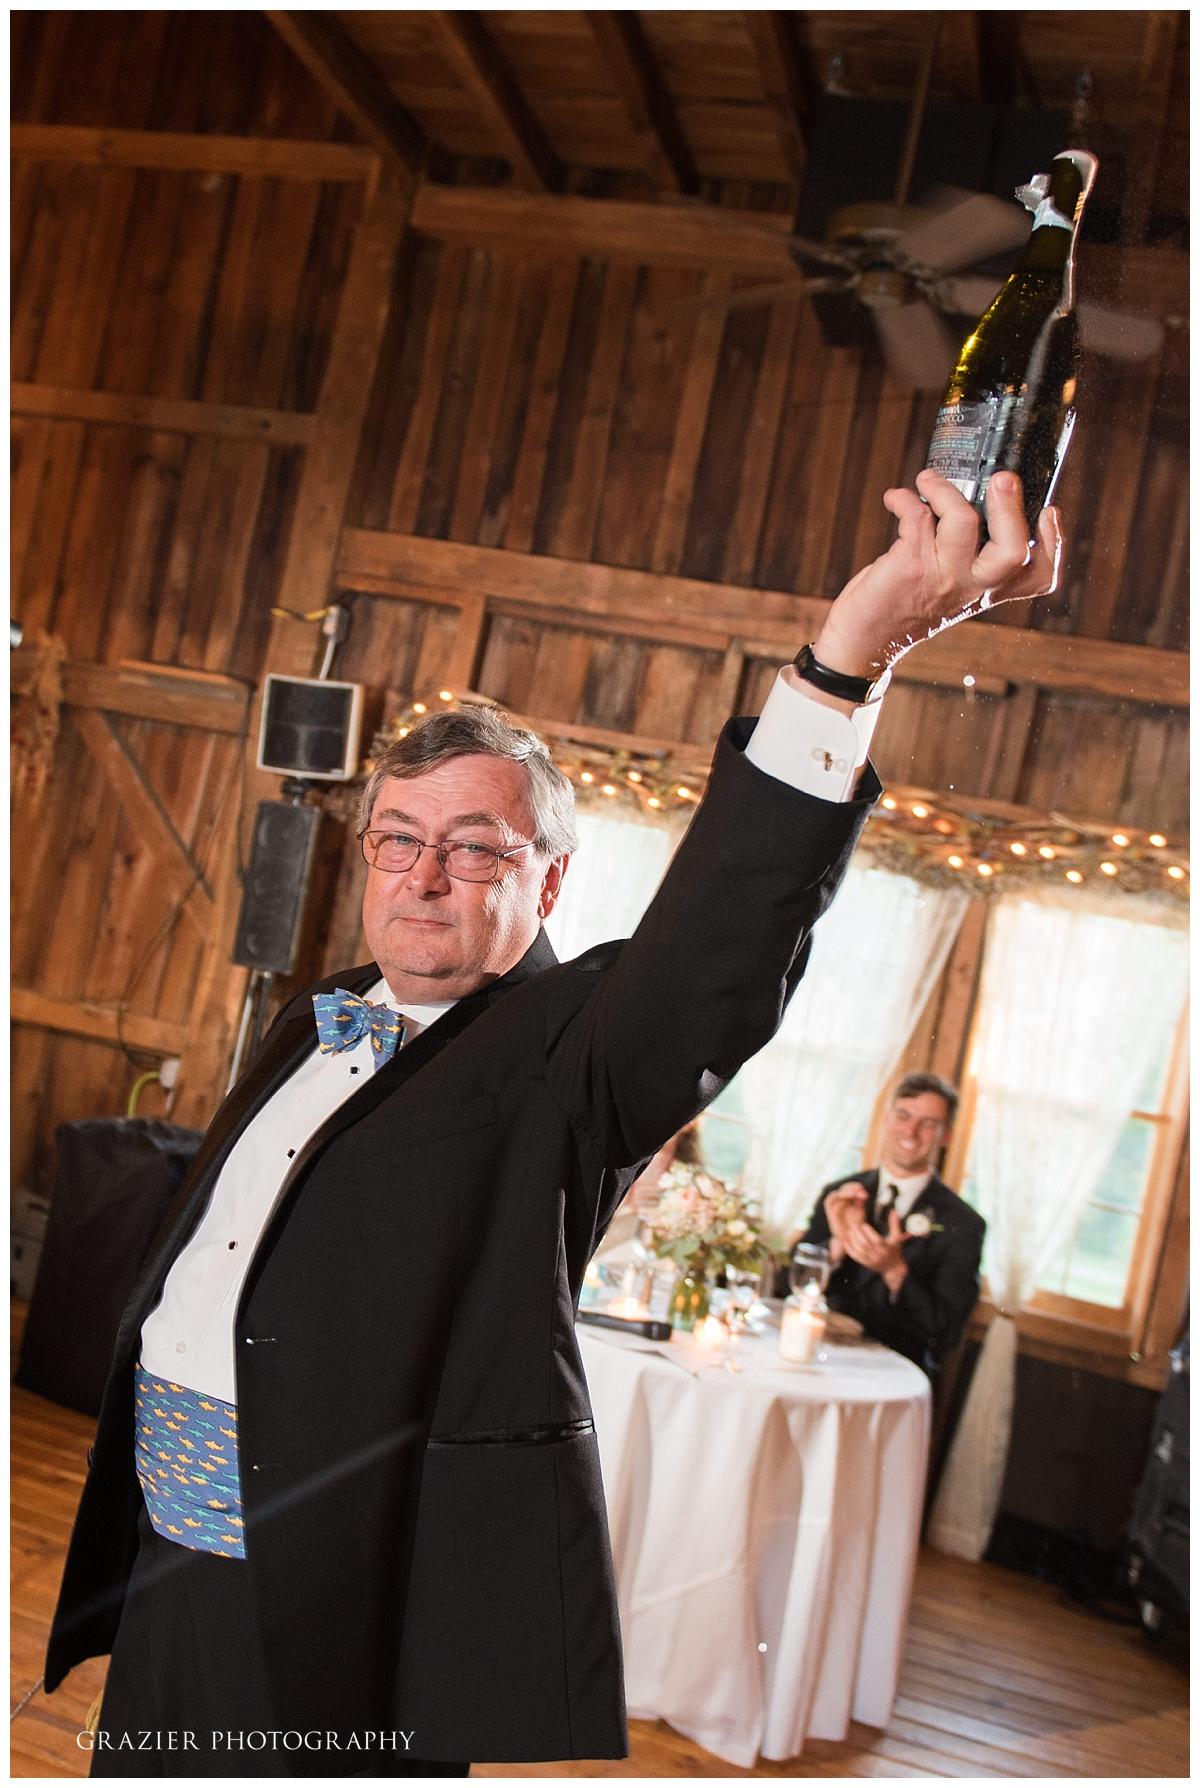 Tyrone Farm Wedding Grazier Photography 2017-93_WEB.jpg